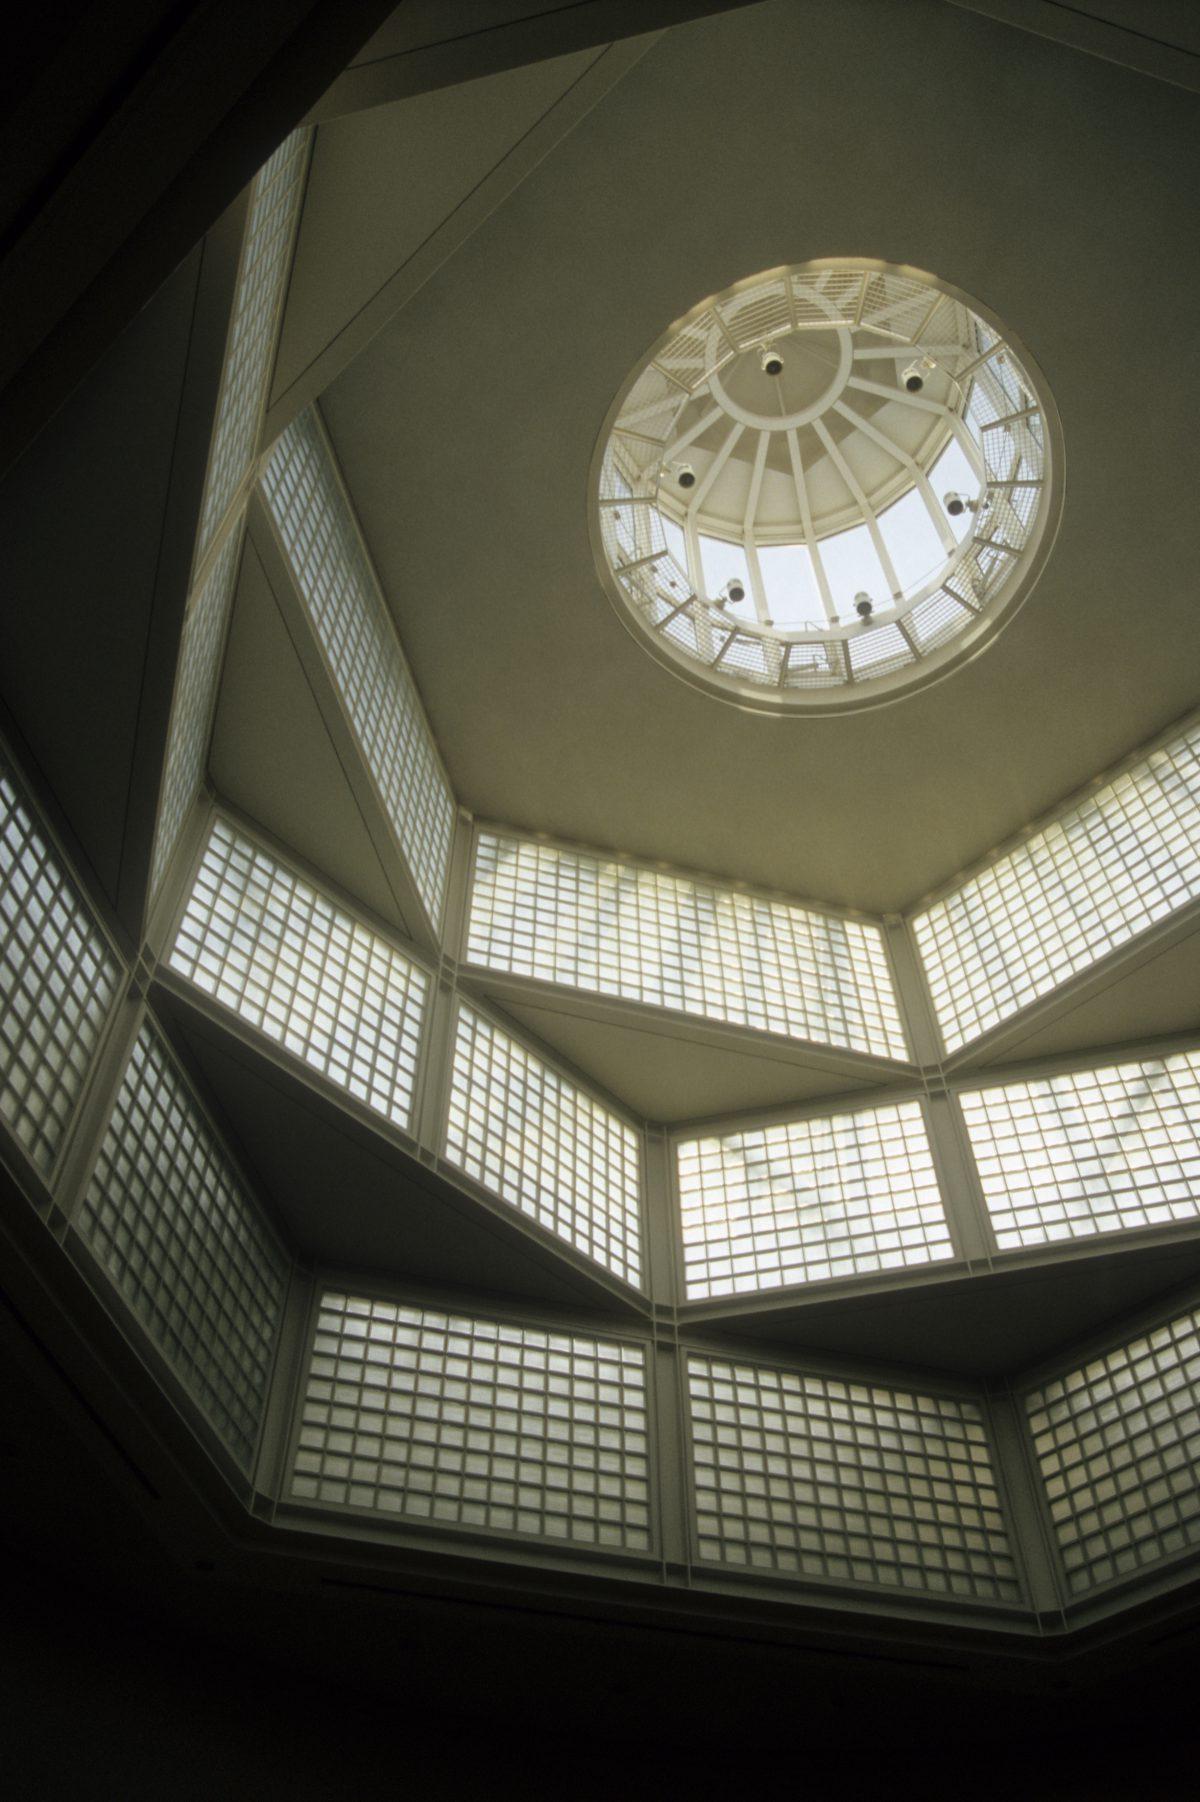 Dome - at Gemäldegalerie, ceiling